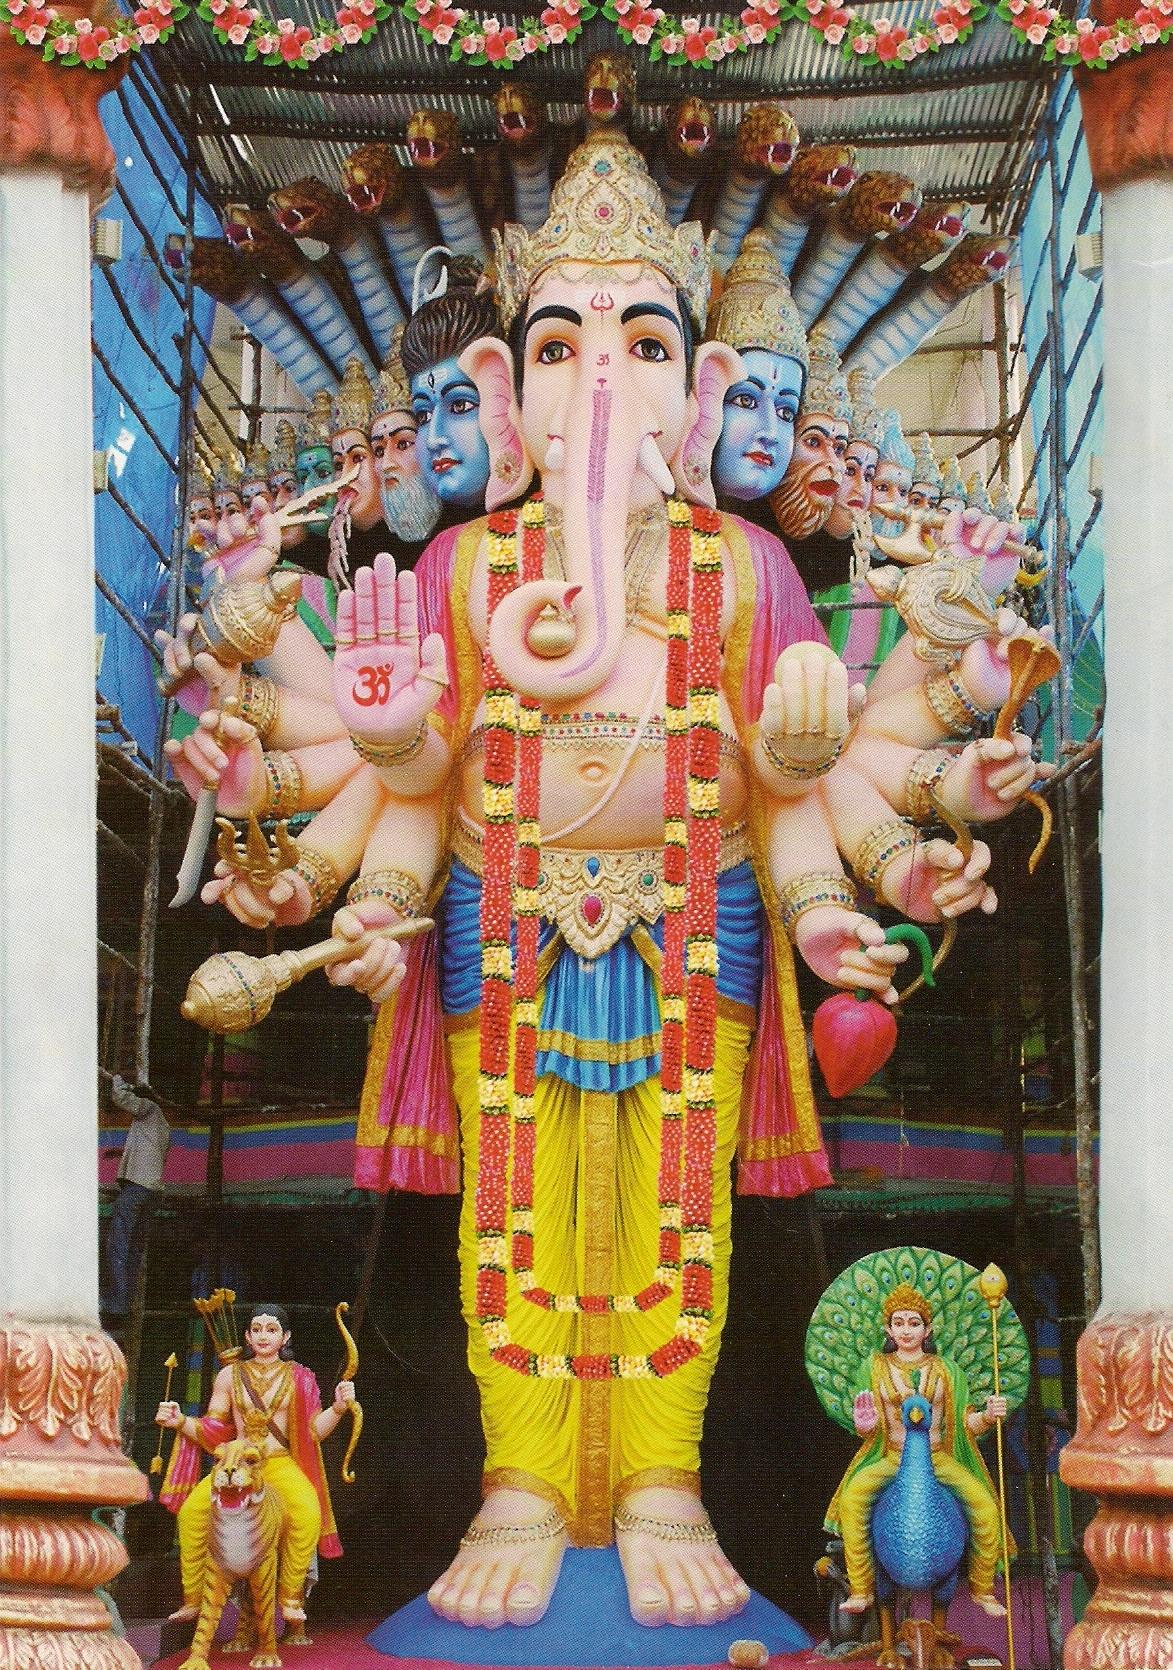 Big ganesh temple in bangalore dating 4